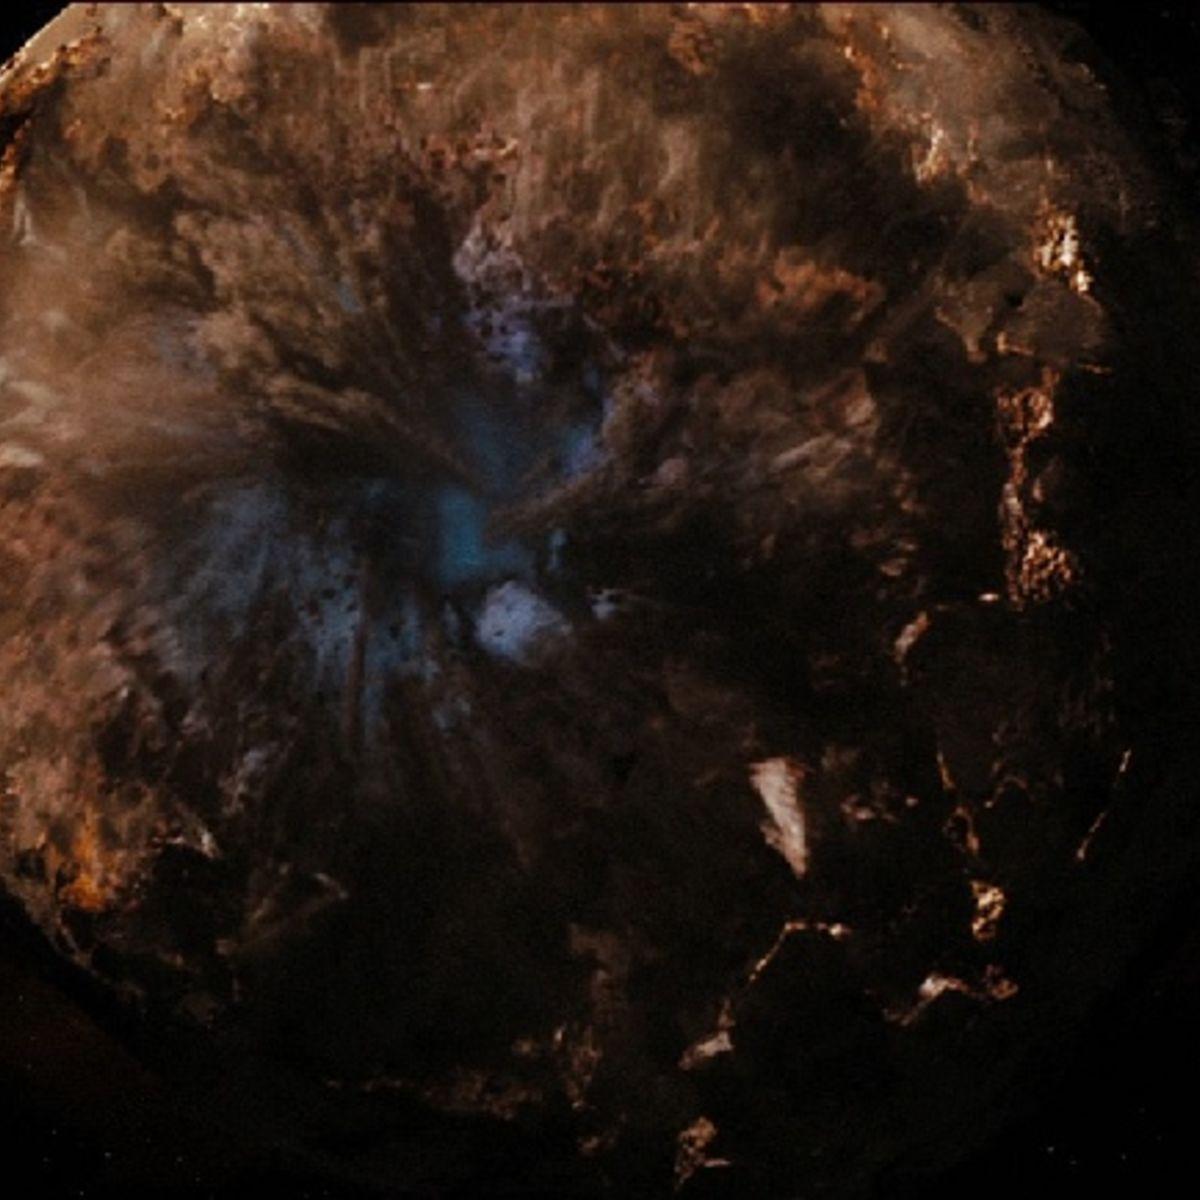 vaporizeplanet.jpg